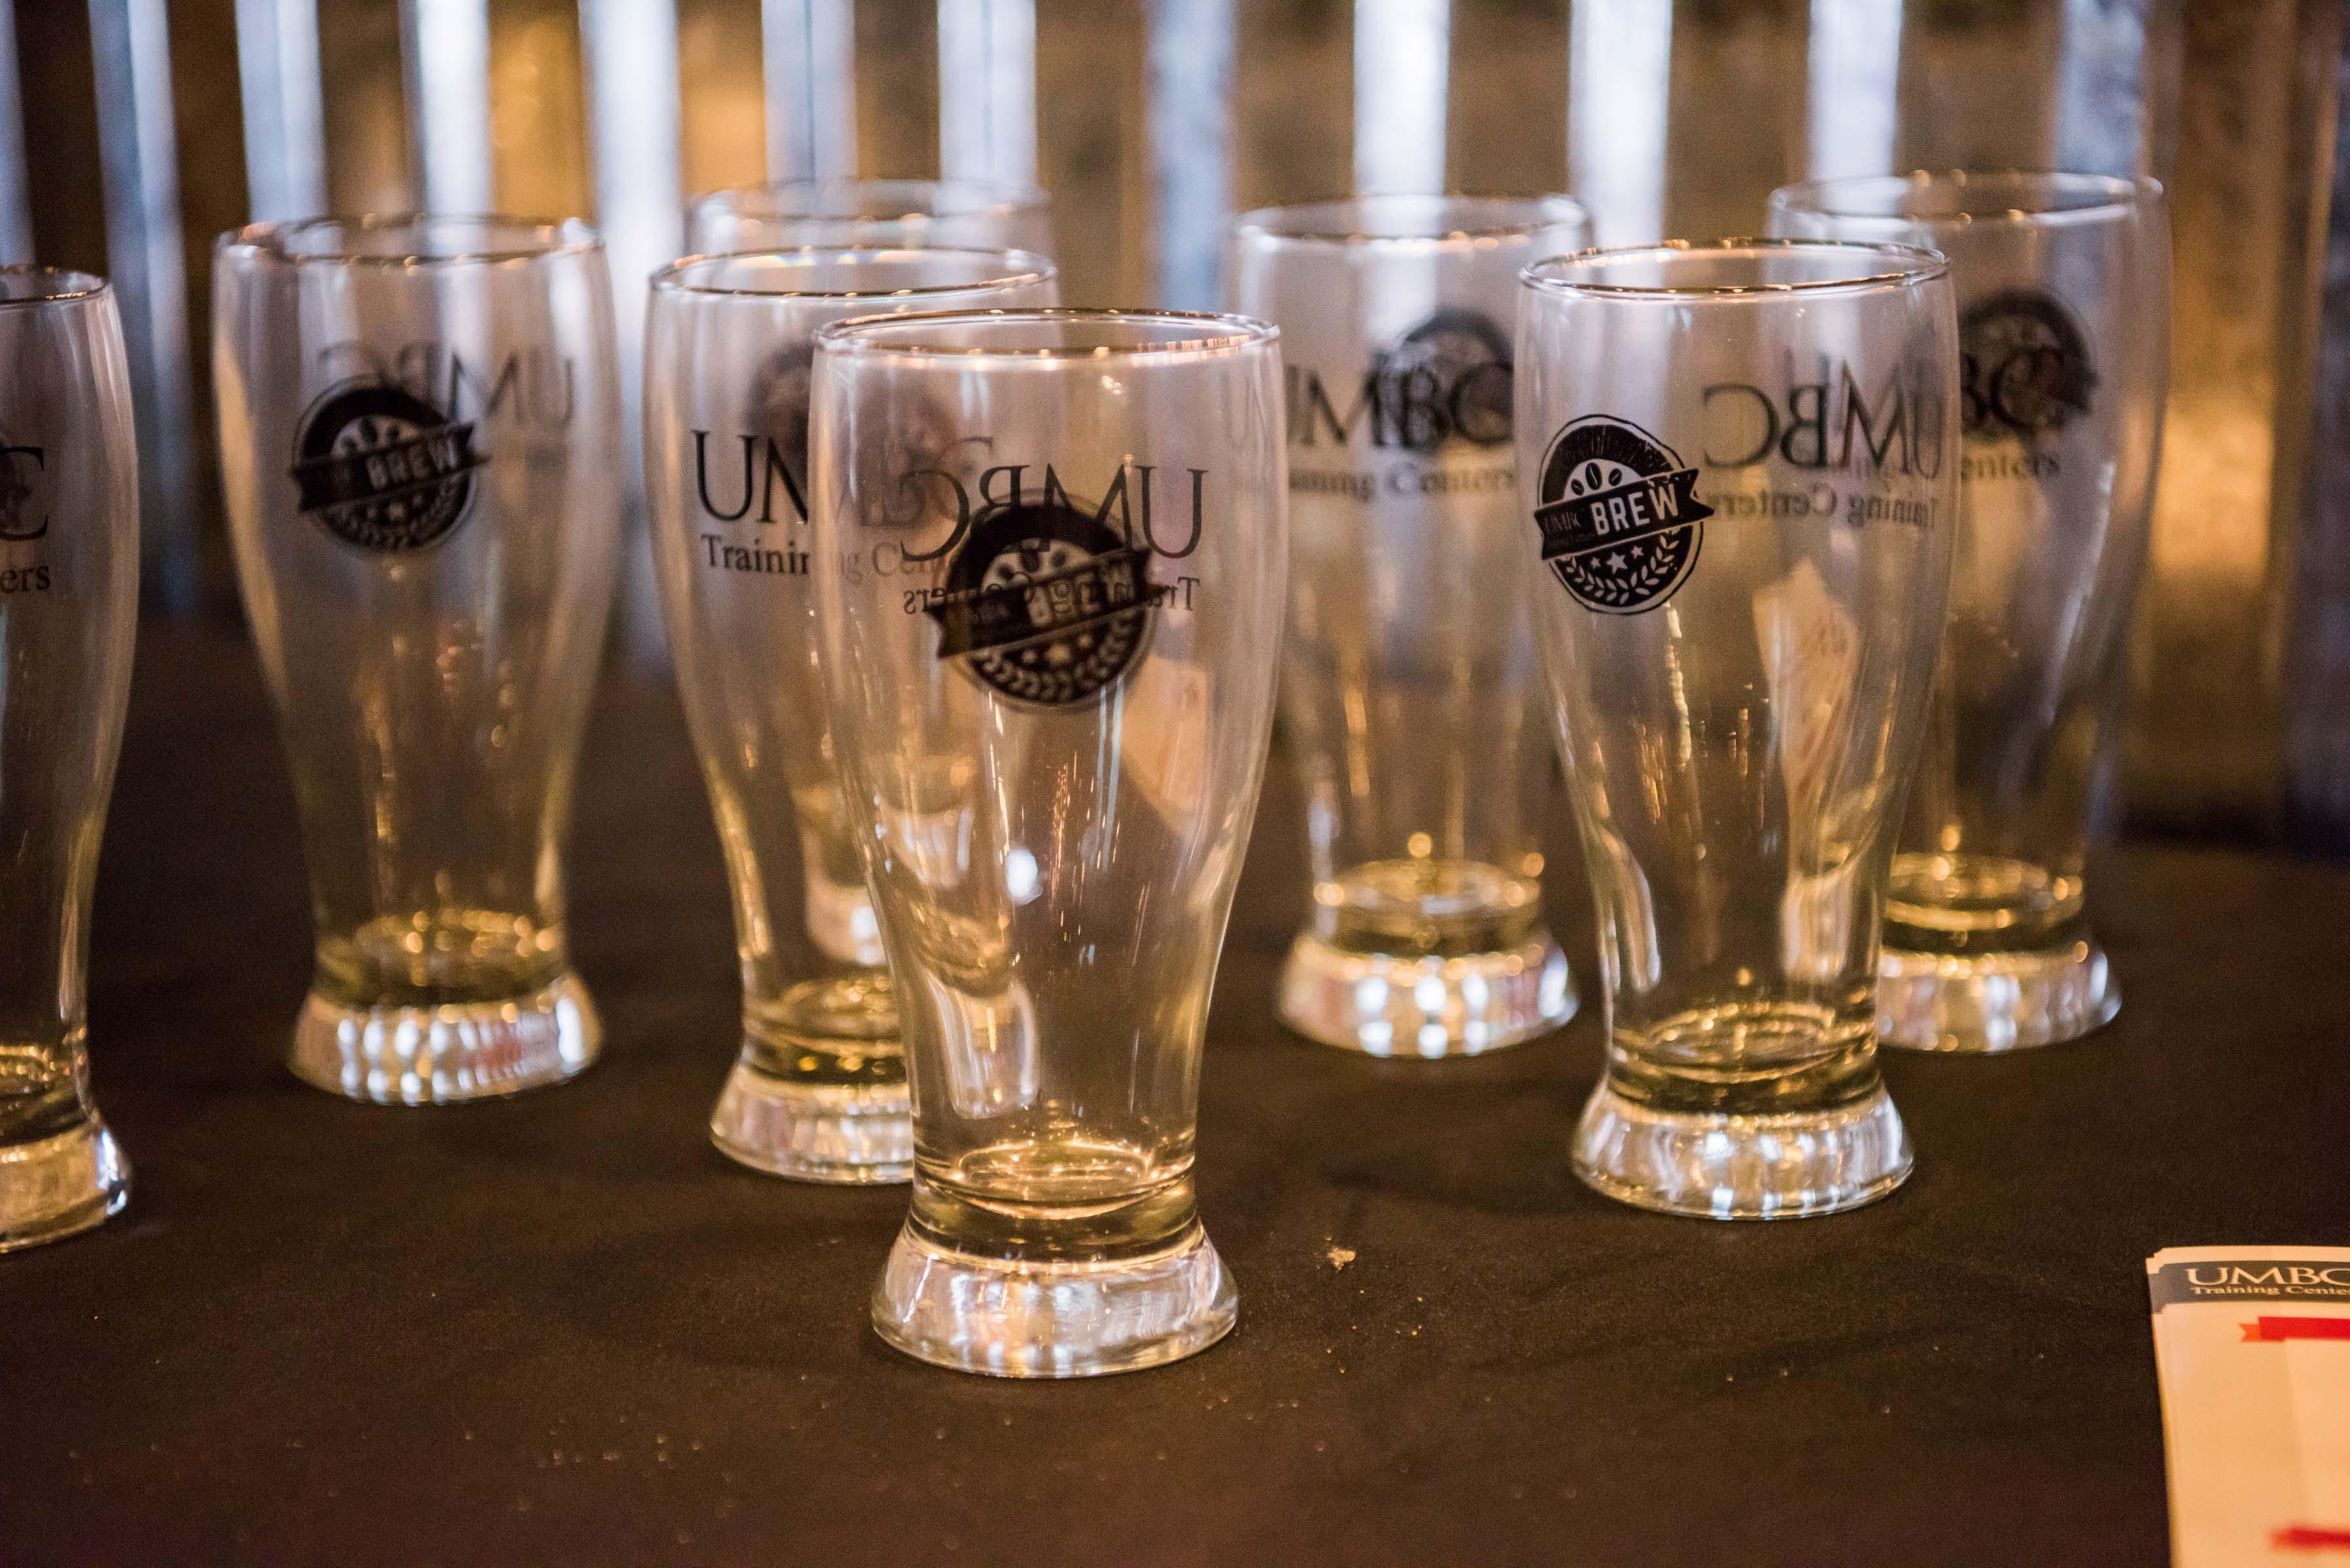 UMBC brew glasses